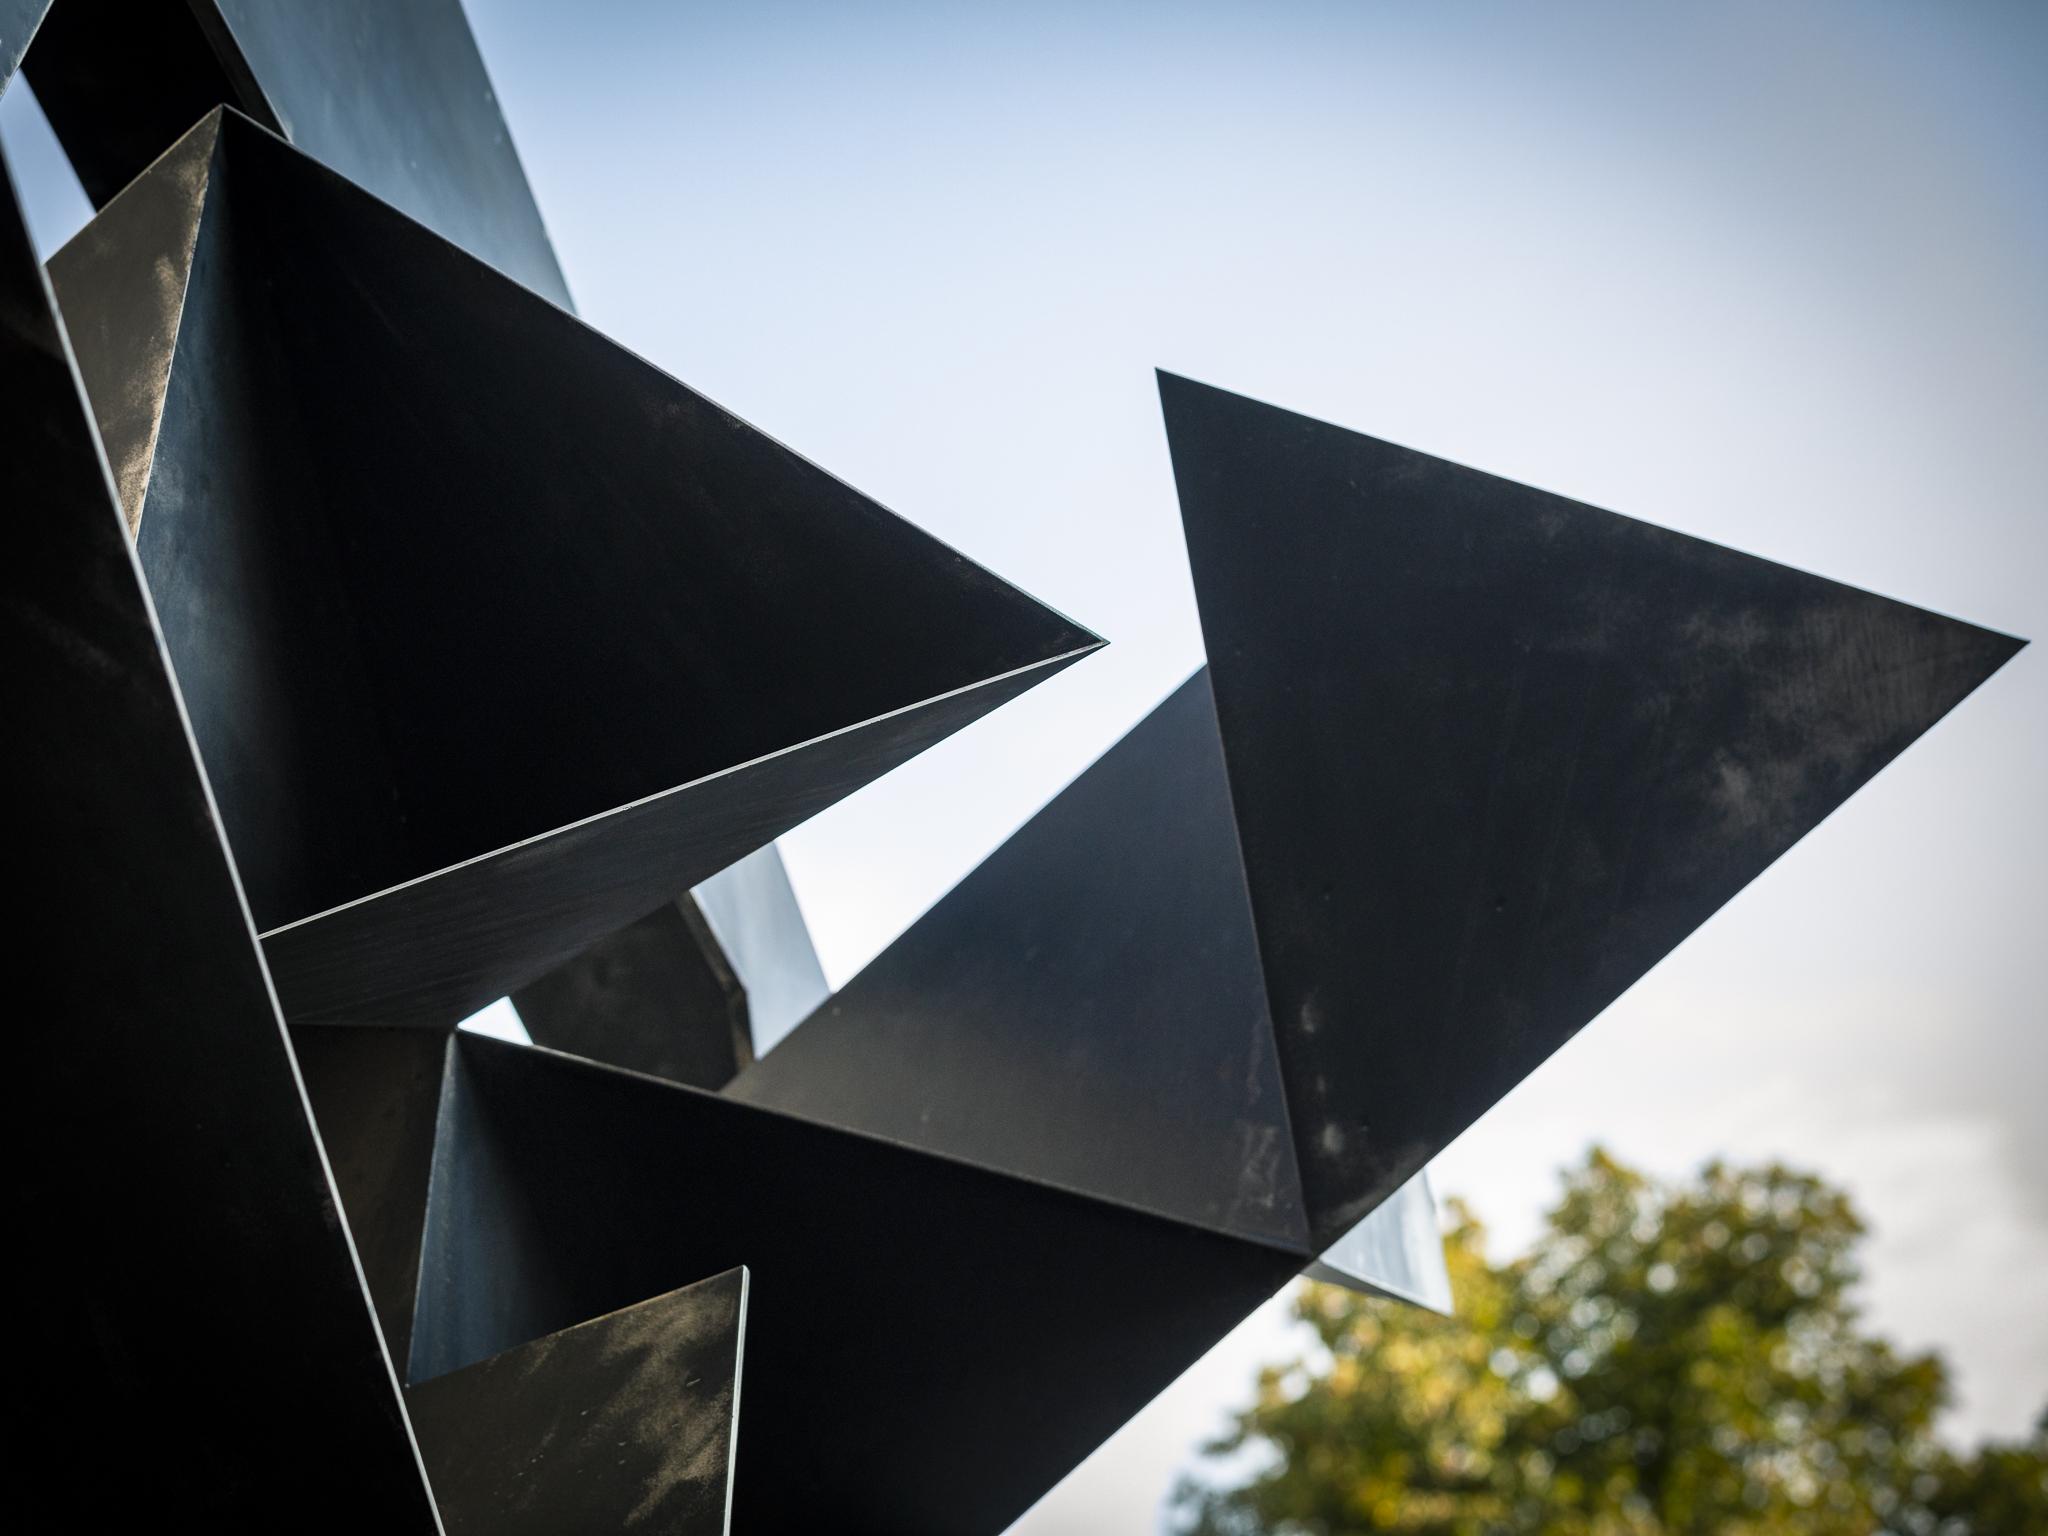 Hans Uhlmann | Stahlplastik 1965